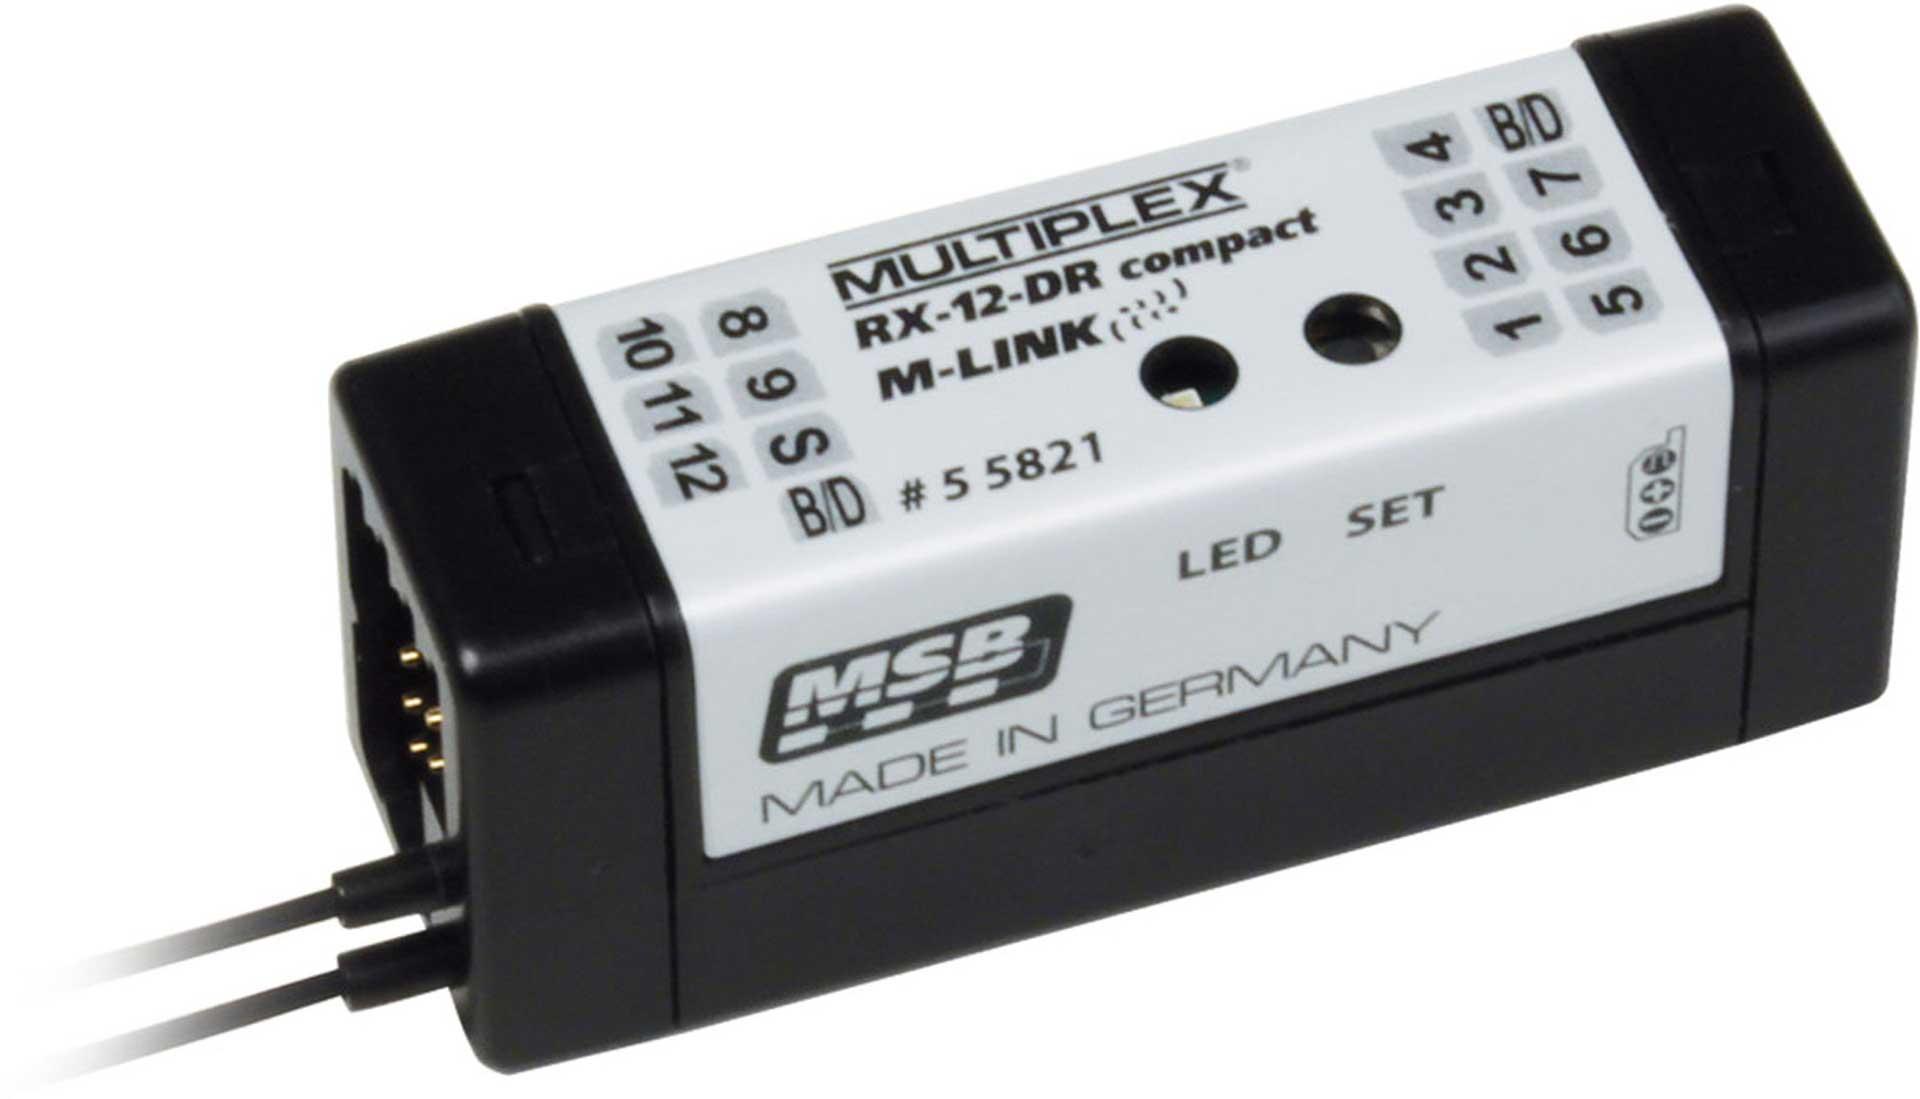 MULTIPLEX RX-12 DR COMPACT 2,4GHZ M-LINK EMPFÄNGER